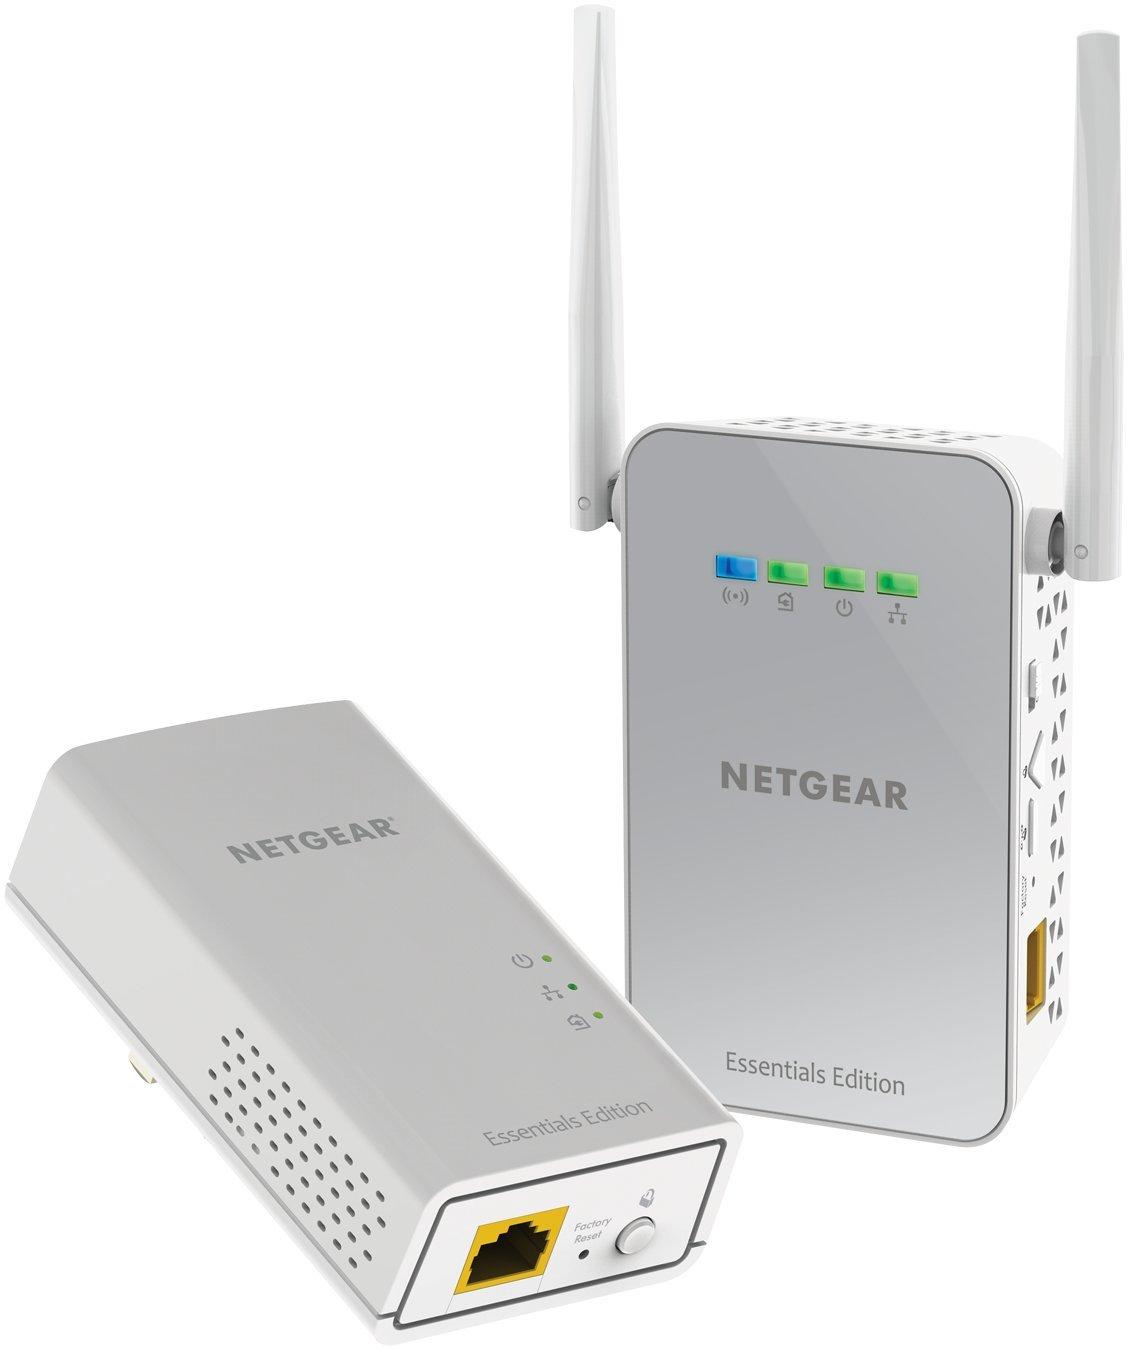 NETGEAR PowerLINE 1000 Mbps WiFi, 802.11ac, 1 Gigabit Port - Essentials Edition (PLW1010-100NAS) by NETGEAR